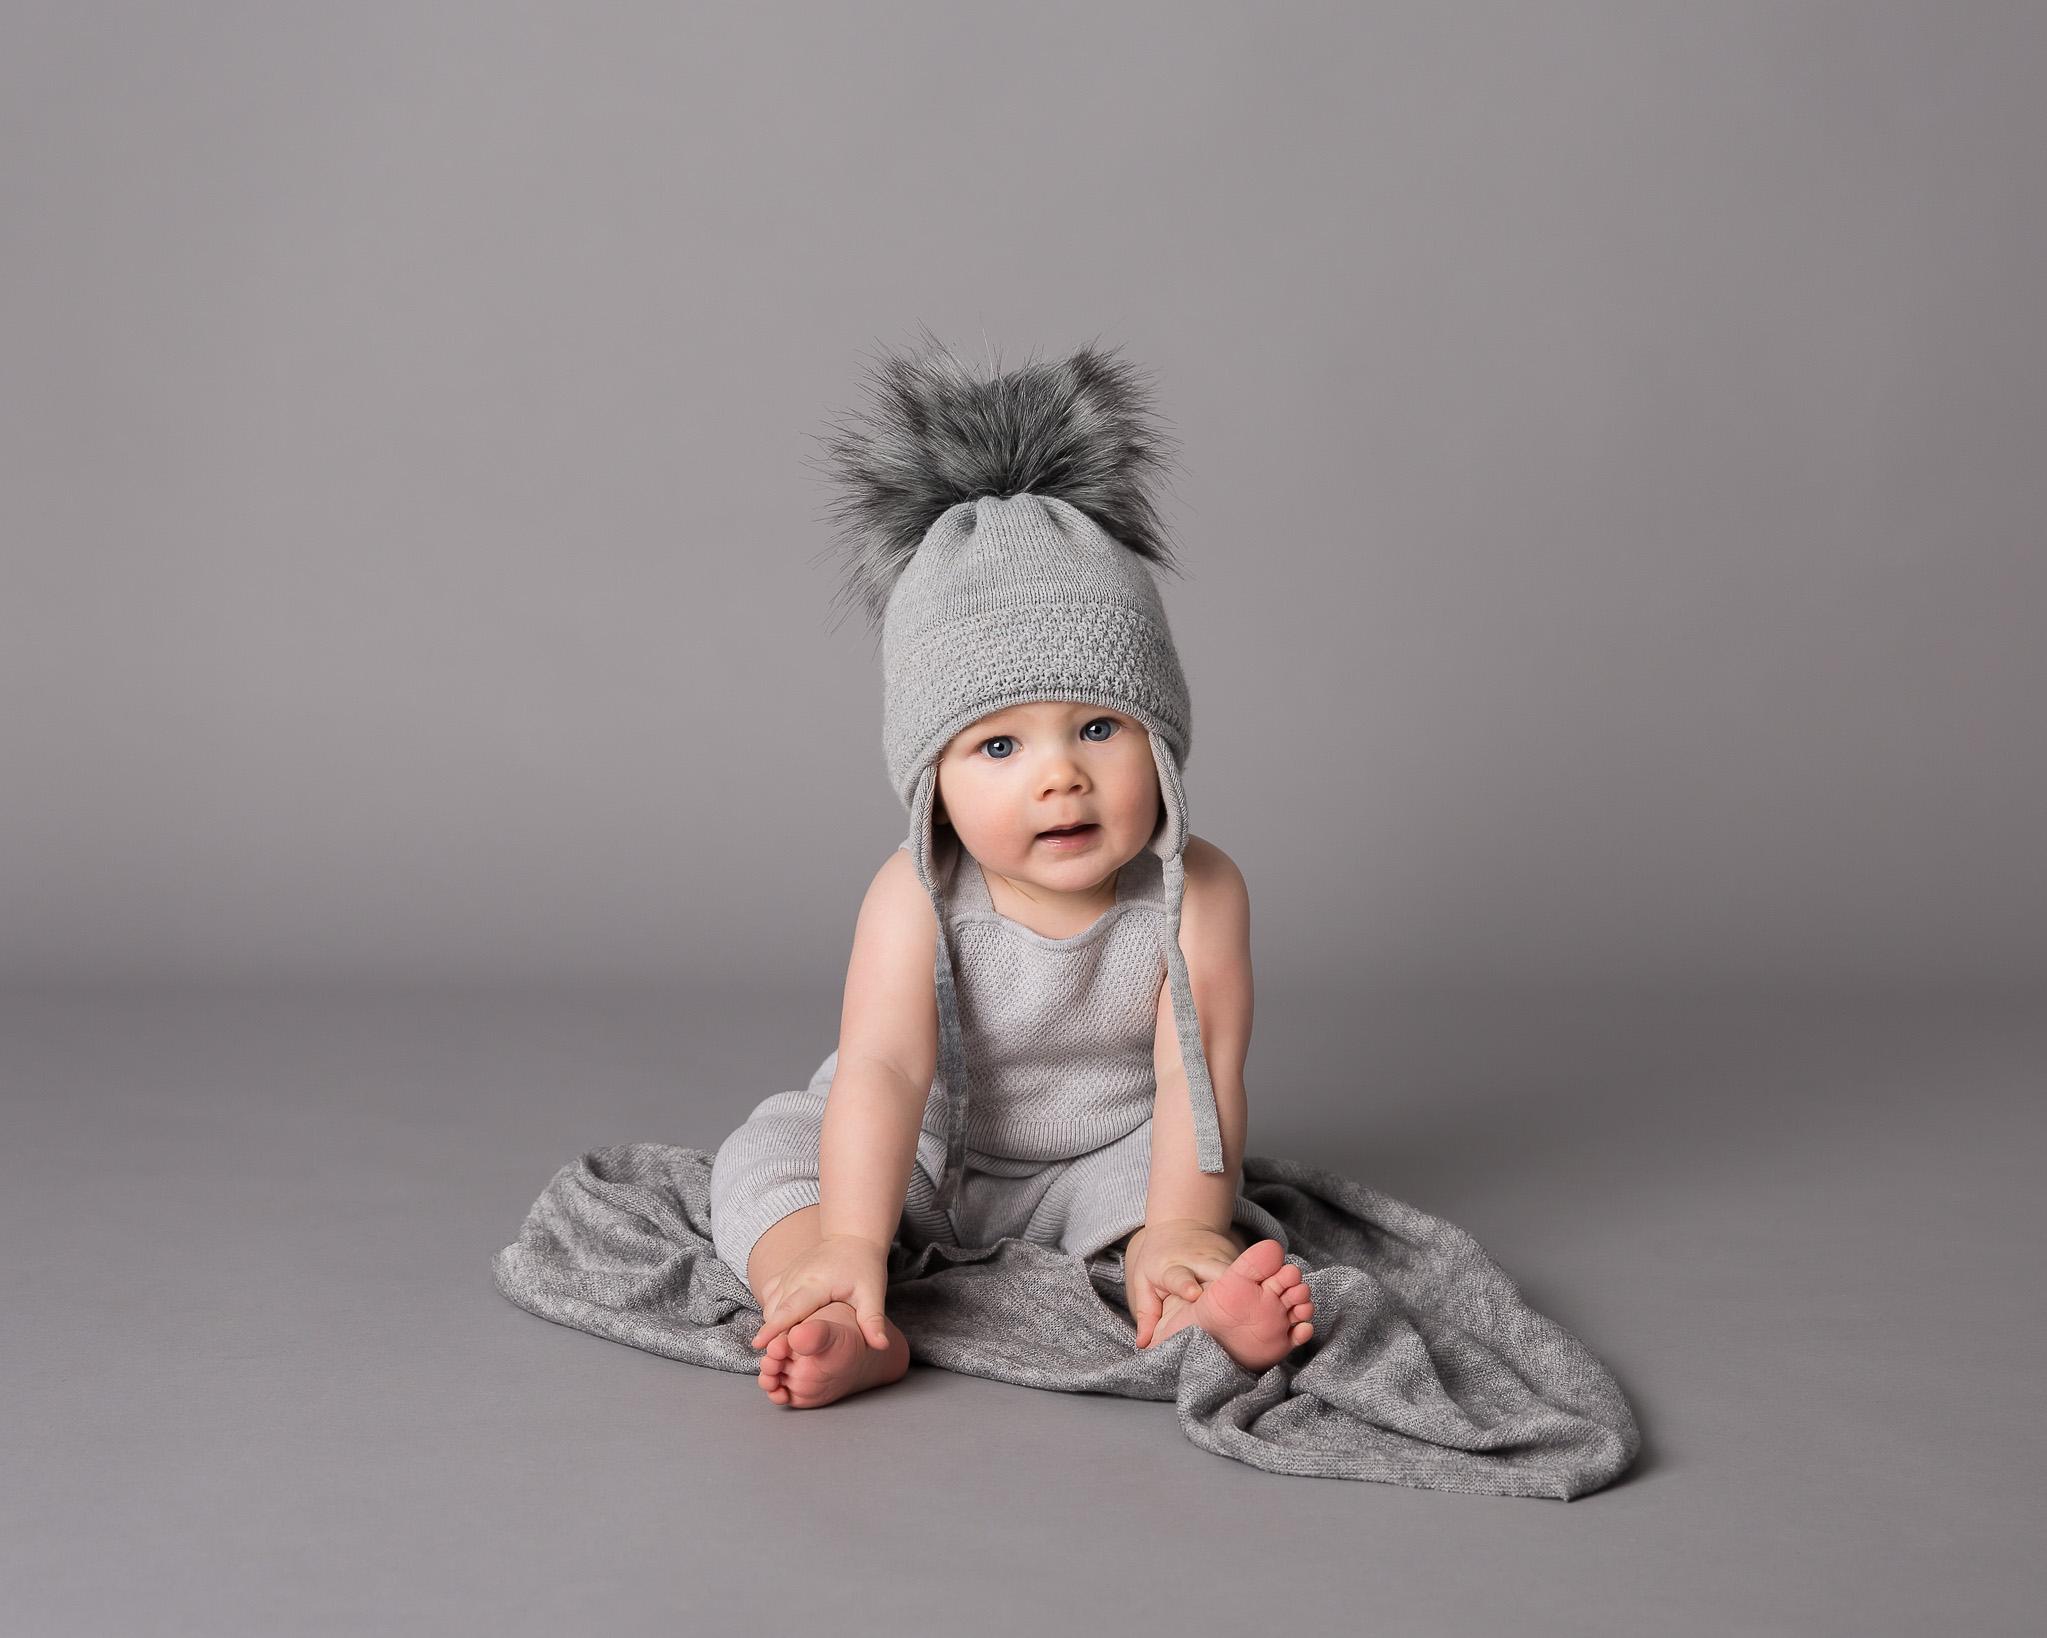 baby photography banchory aberdeen baby photographer-2.jpg